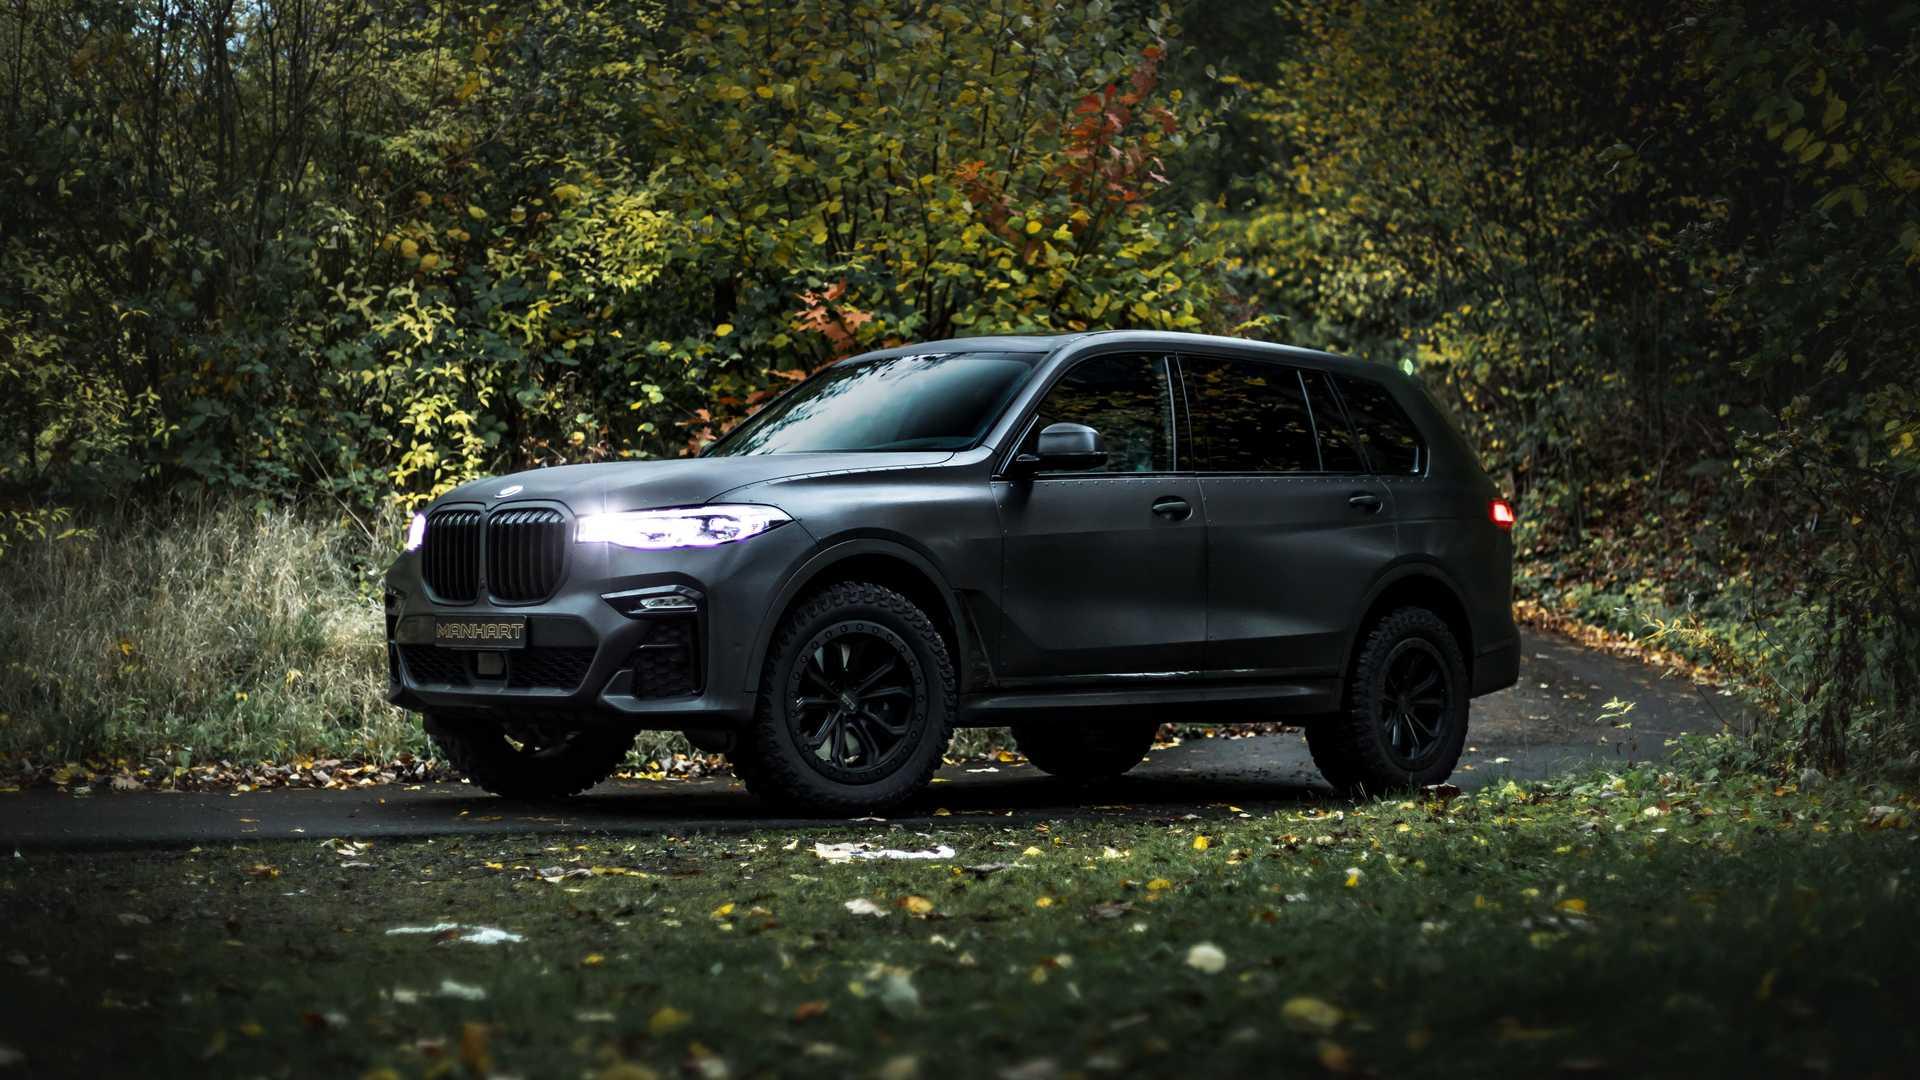 BMW-X7-Dirt-Edition-By-Manhart-4